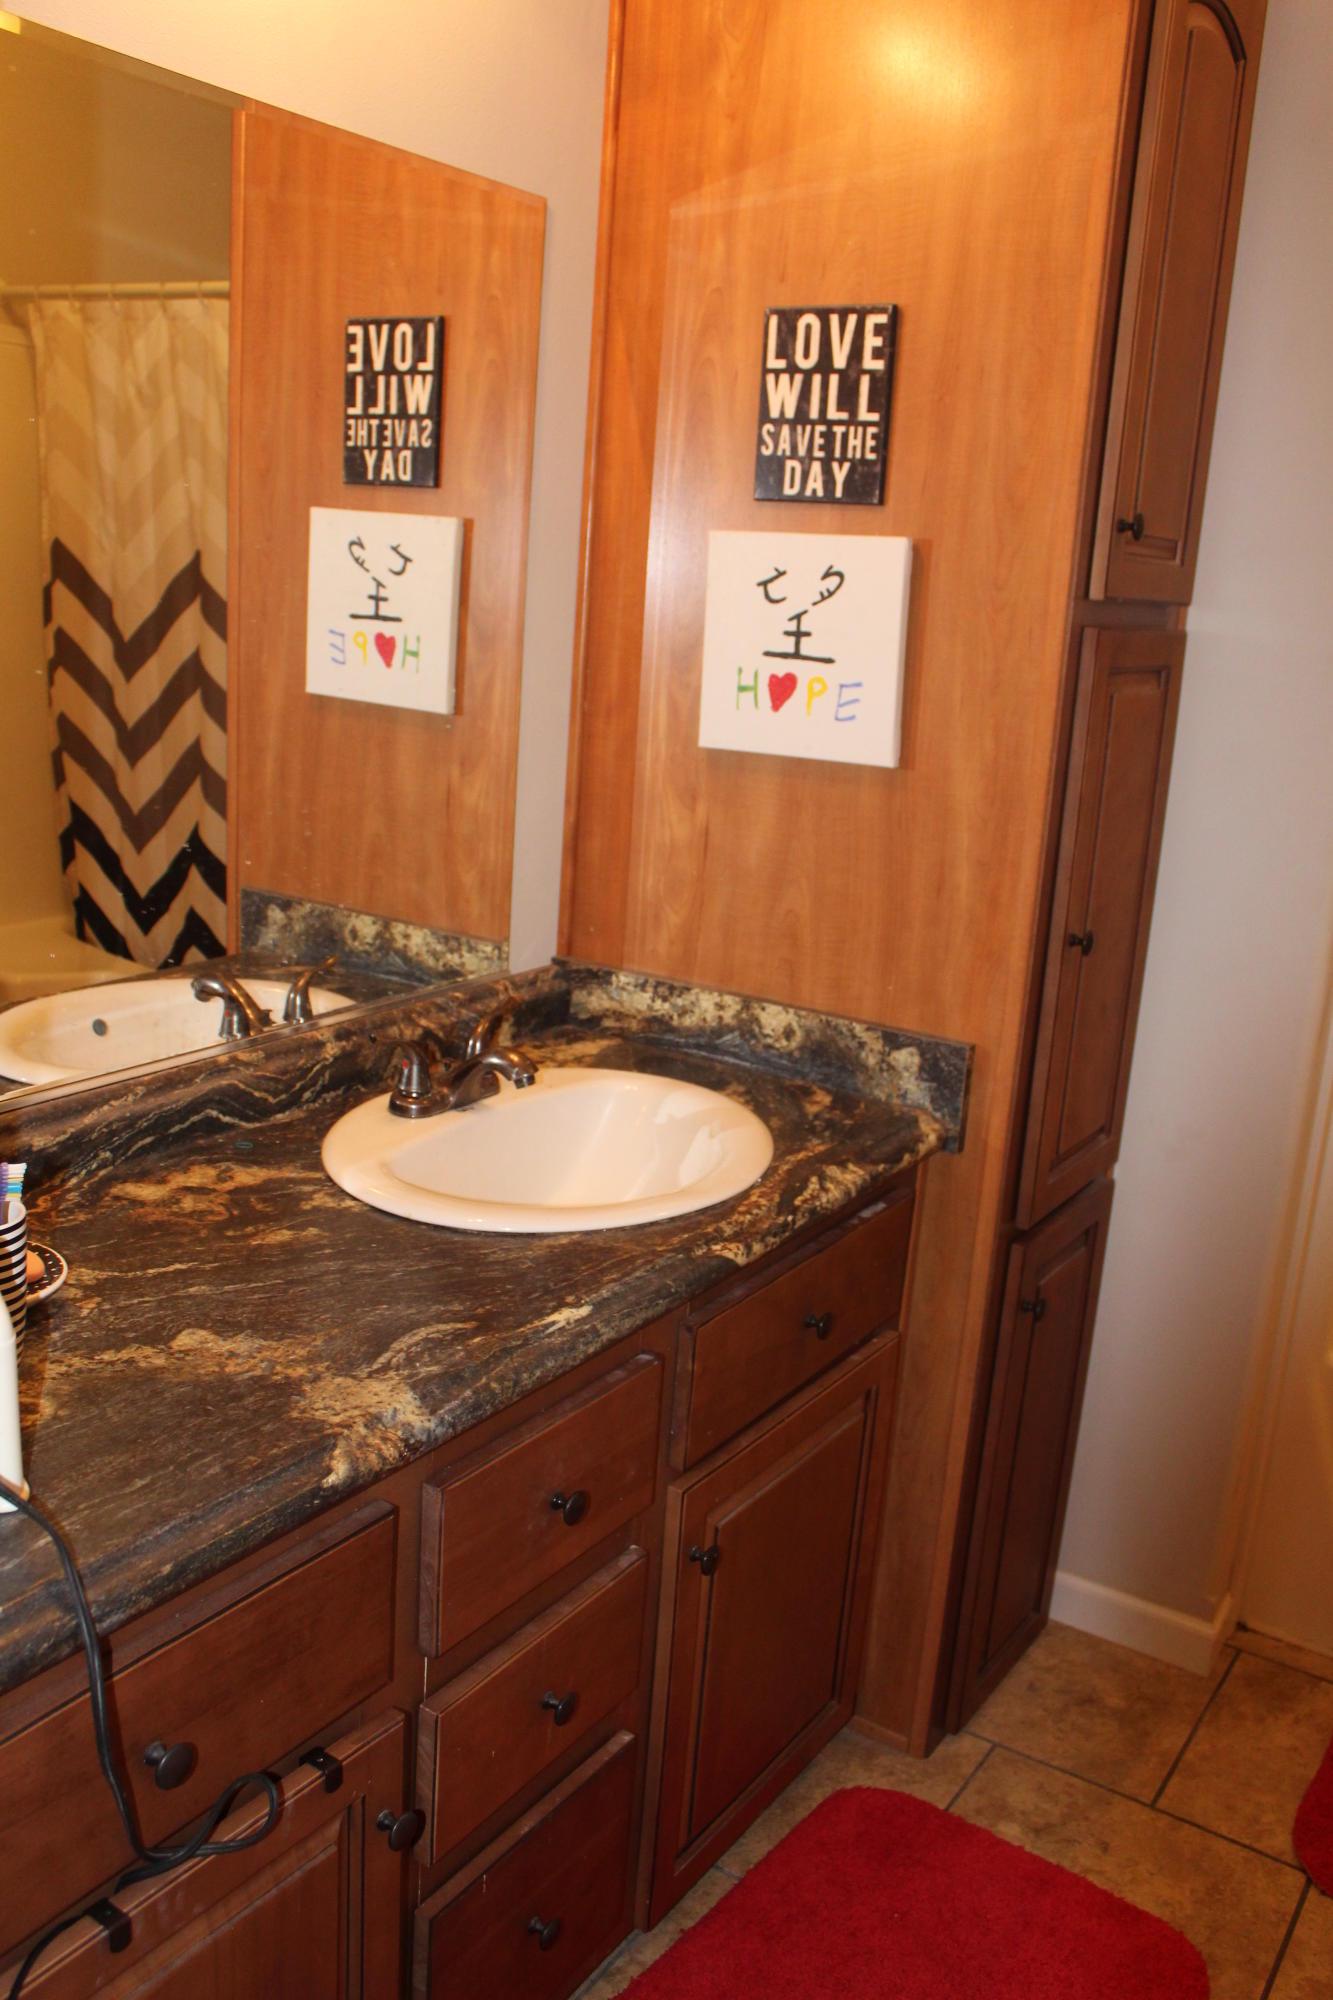 Merryville home for sale, 182 Willis Travis Rd, Merryville LA - $229,000